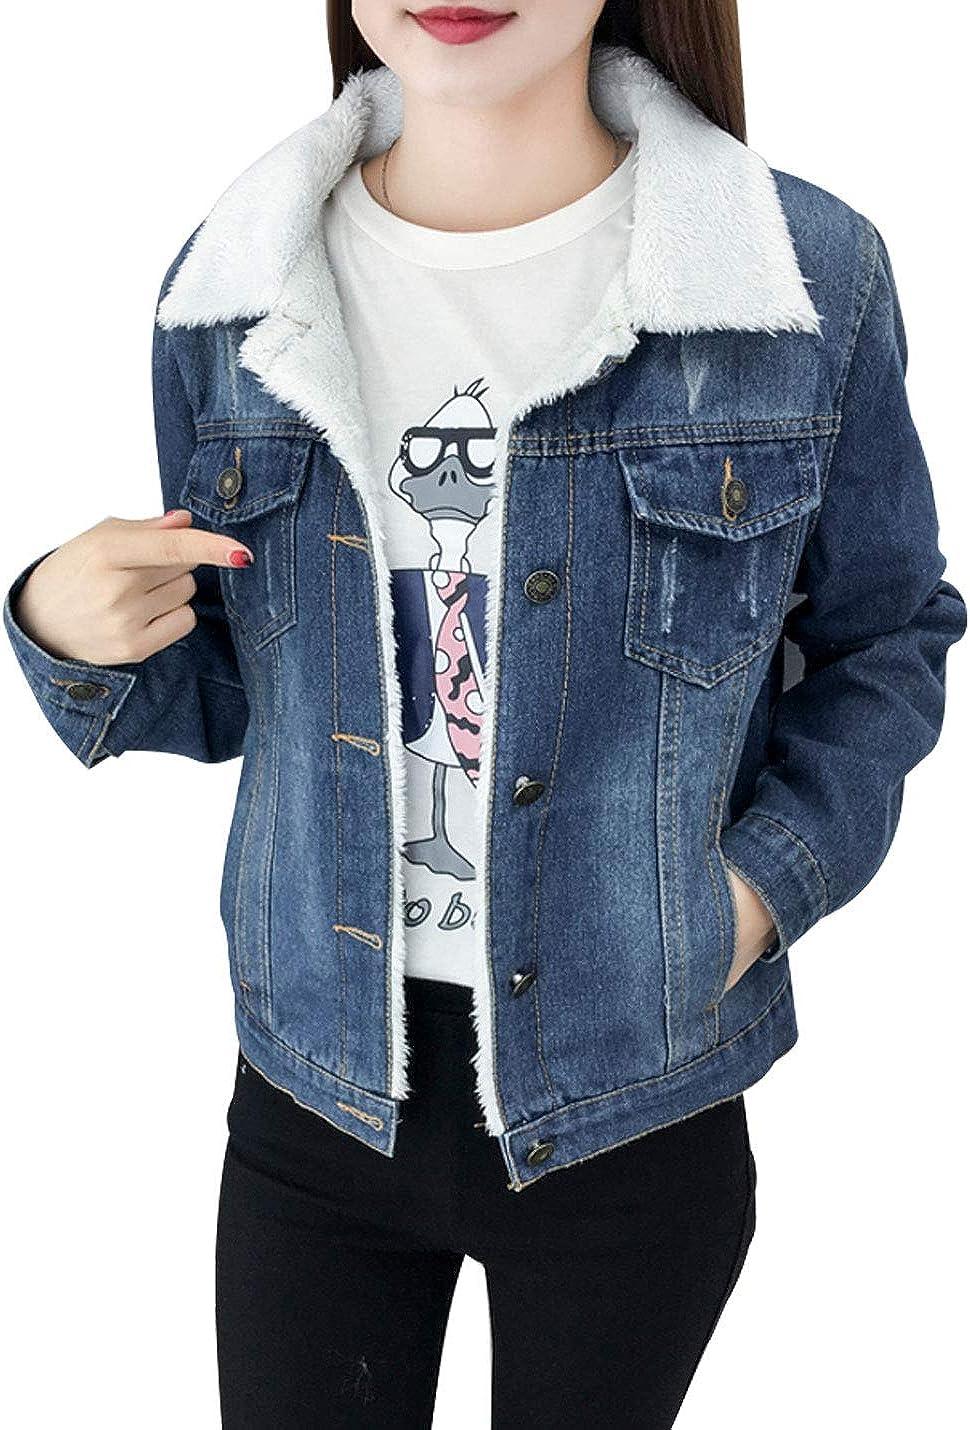 Omoone Women's Faux Fur Collar Short Ripped Fleece Lined Loose Denim Jacket Coat